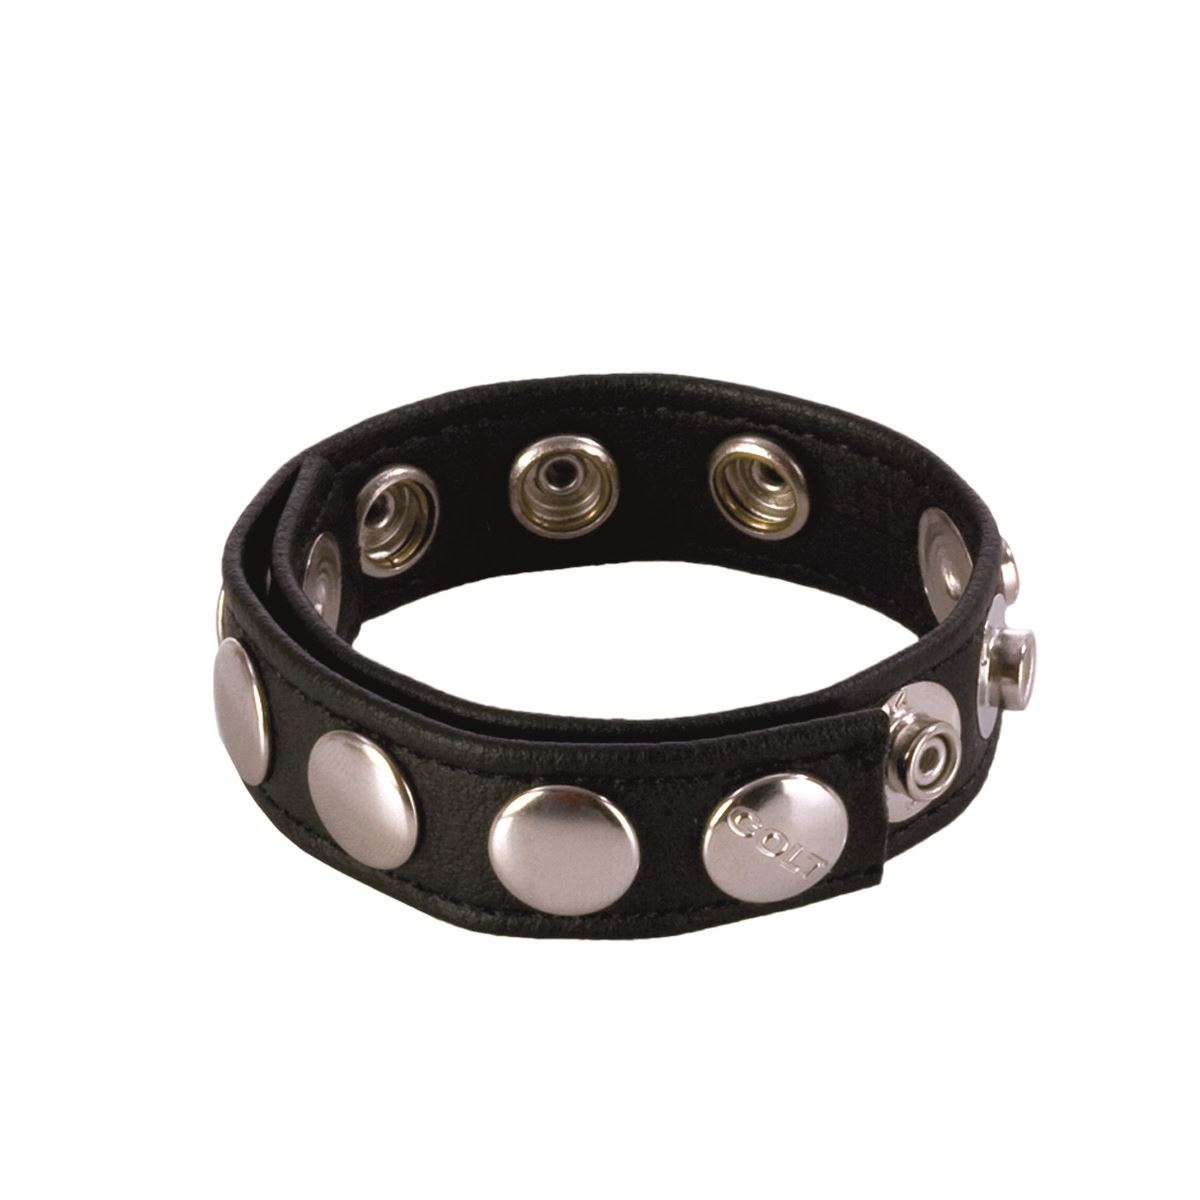 0014034_colt-8-snap-fastener-leather-strap_dq8rsub1ffjjg3m7.jpeg